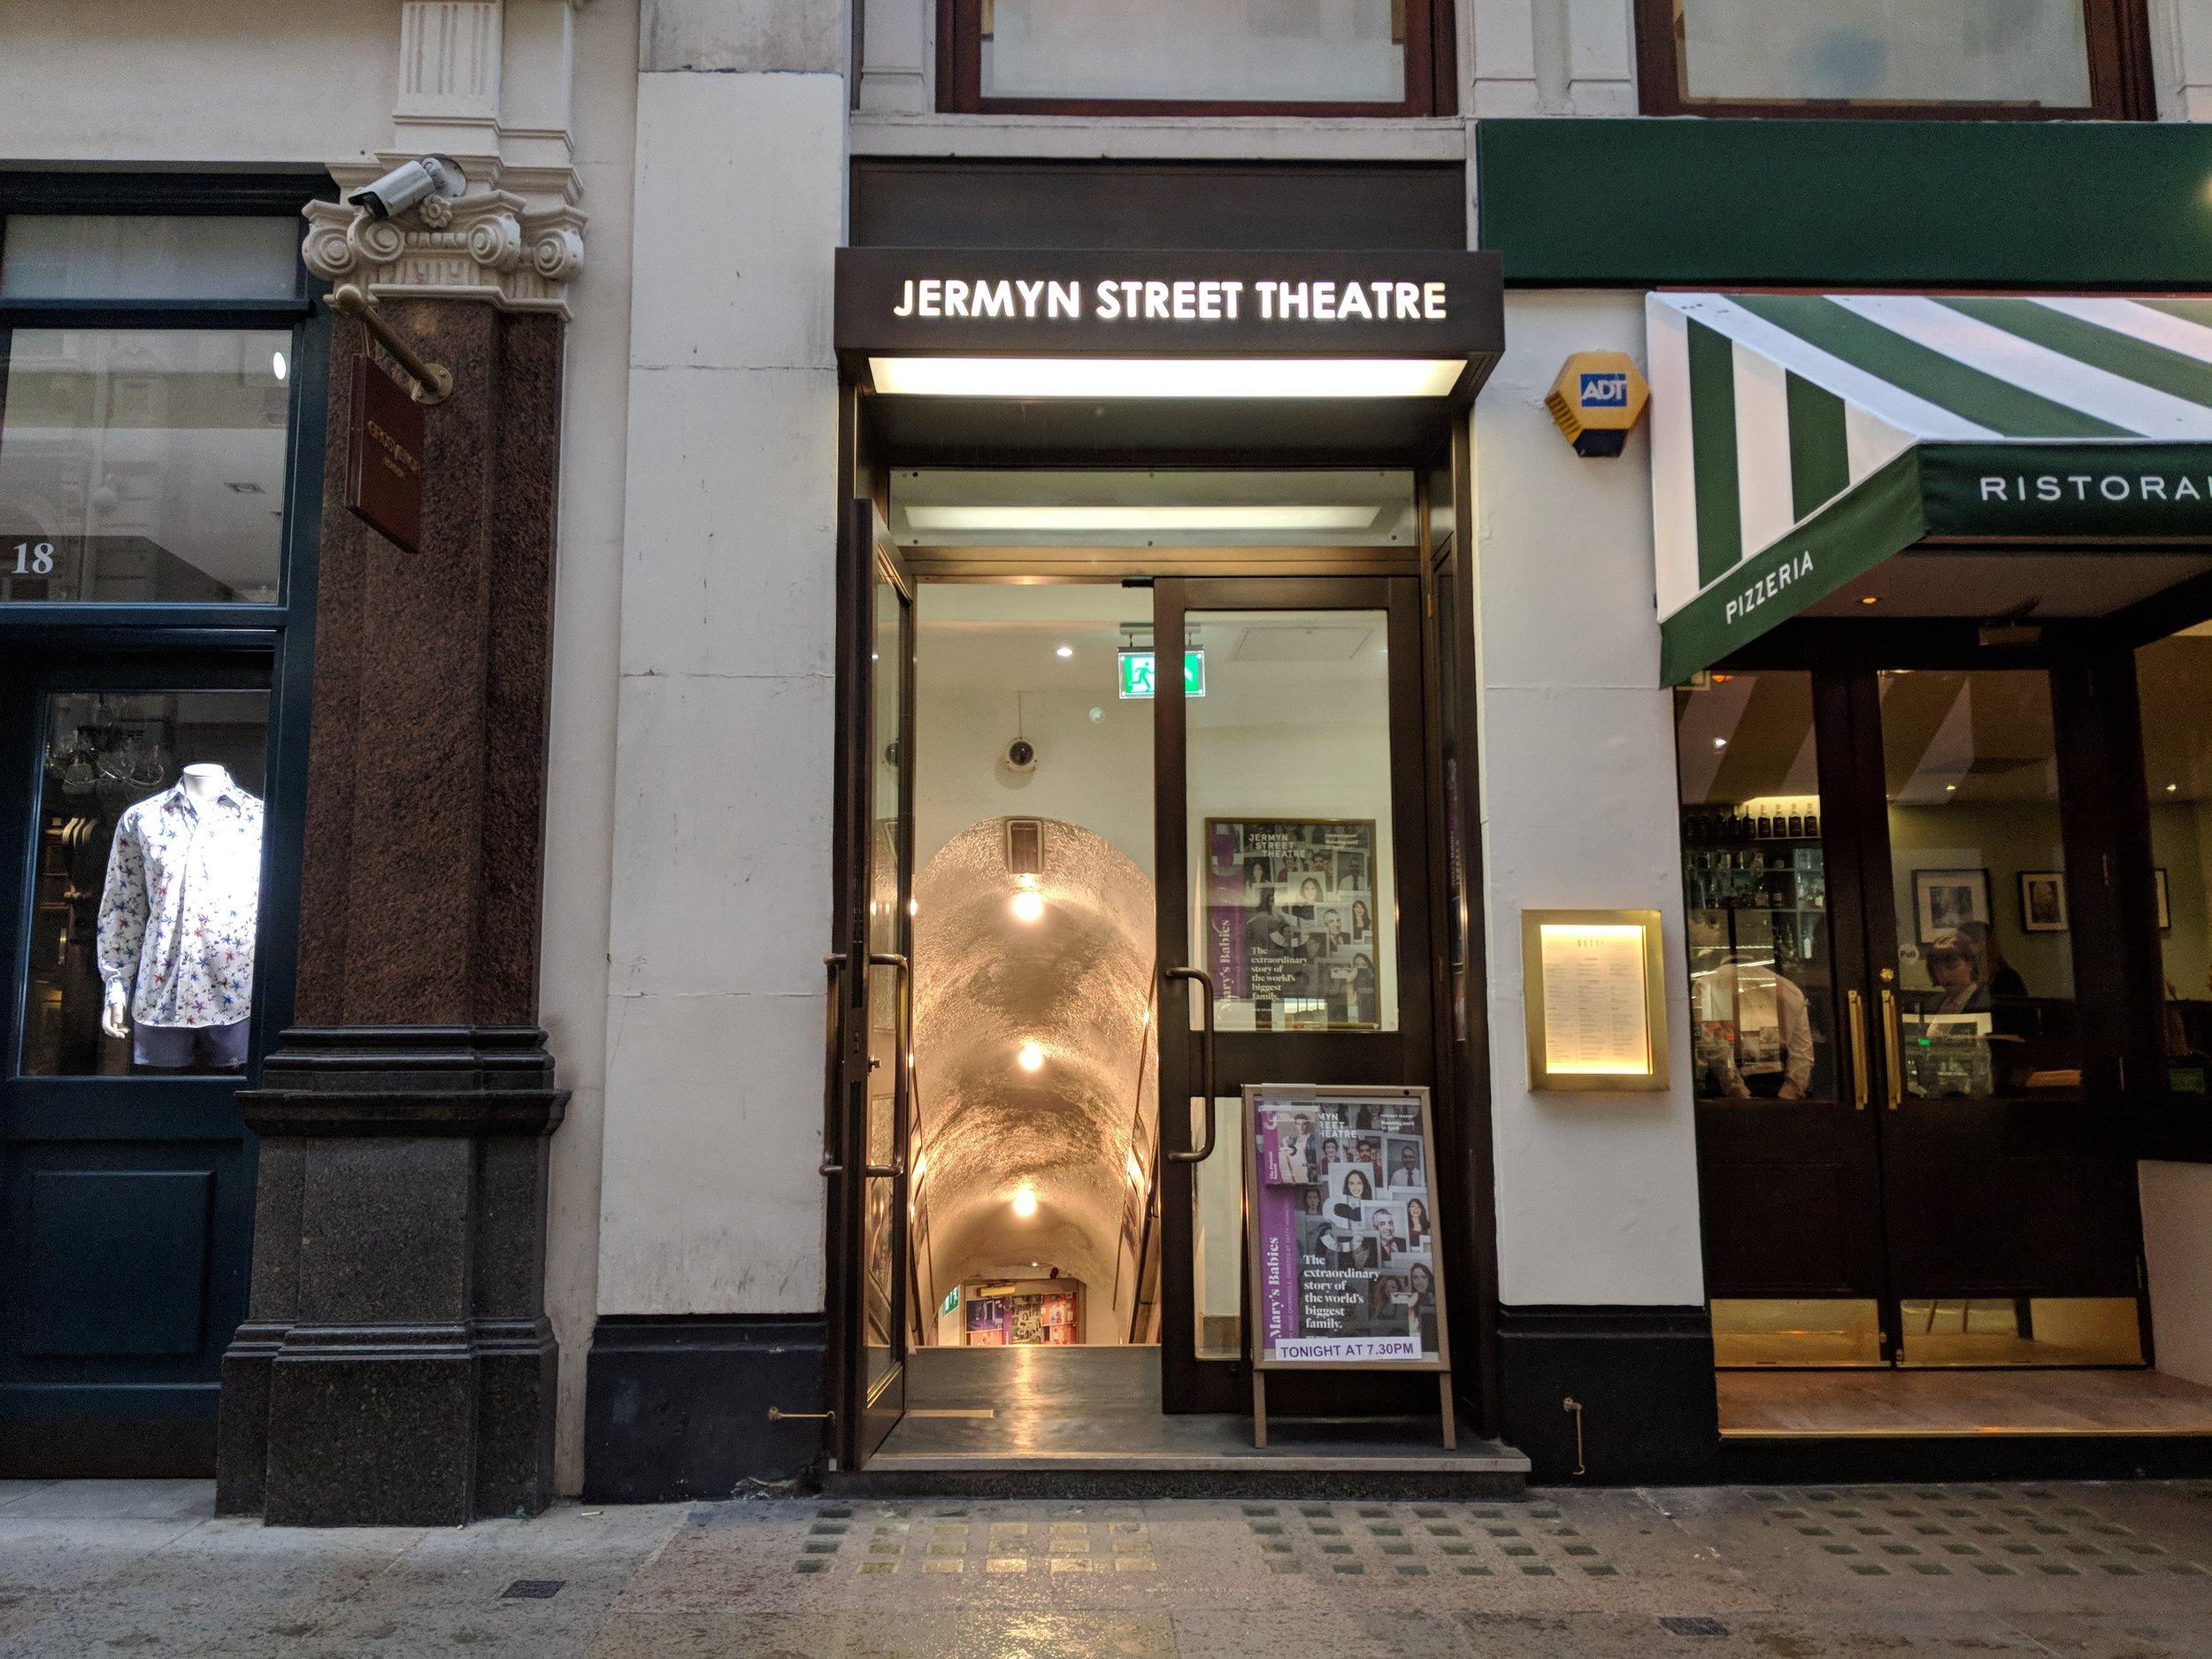 Jermyn Street Theatre - visited 02/04/2019